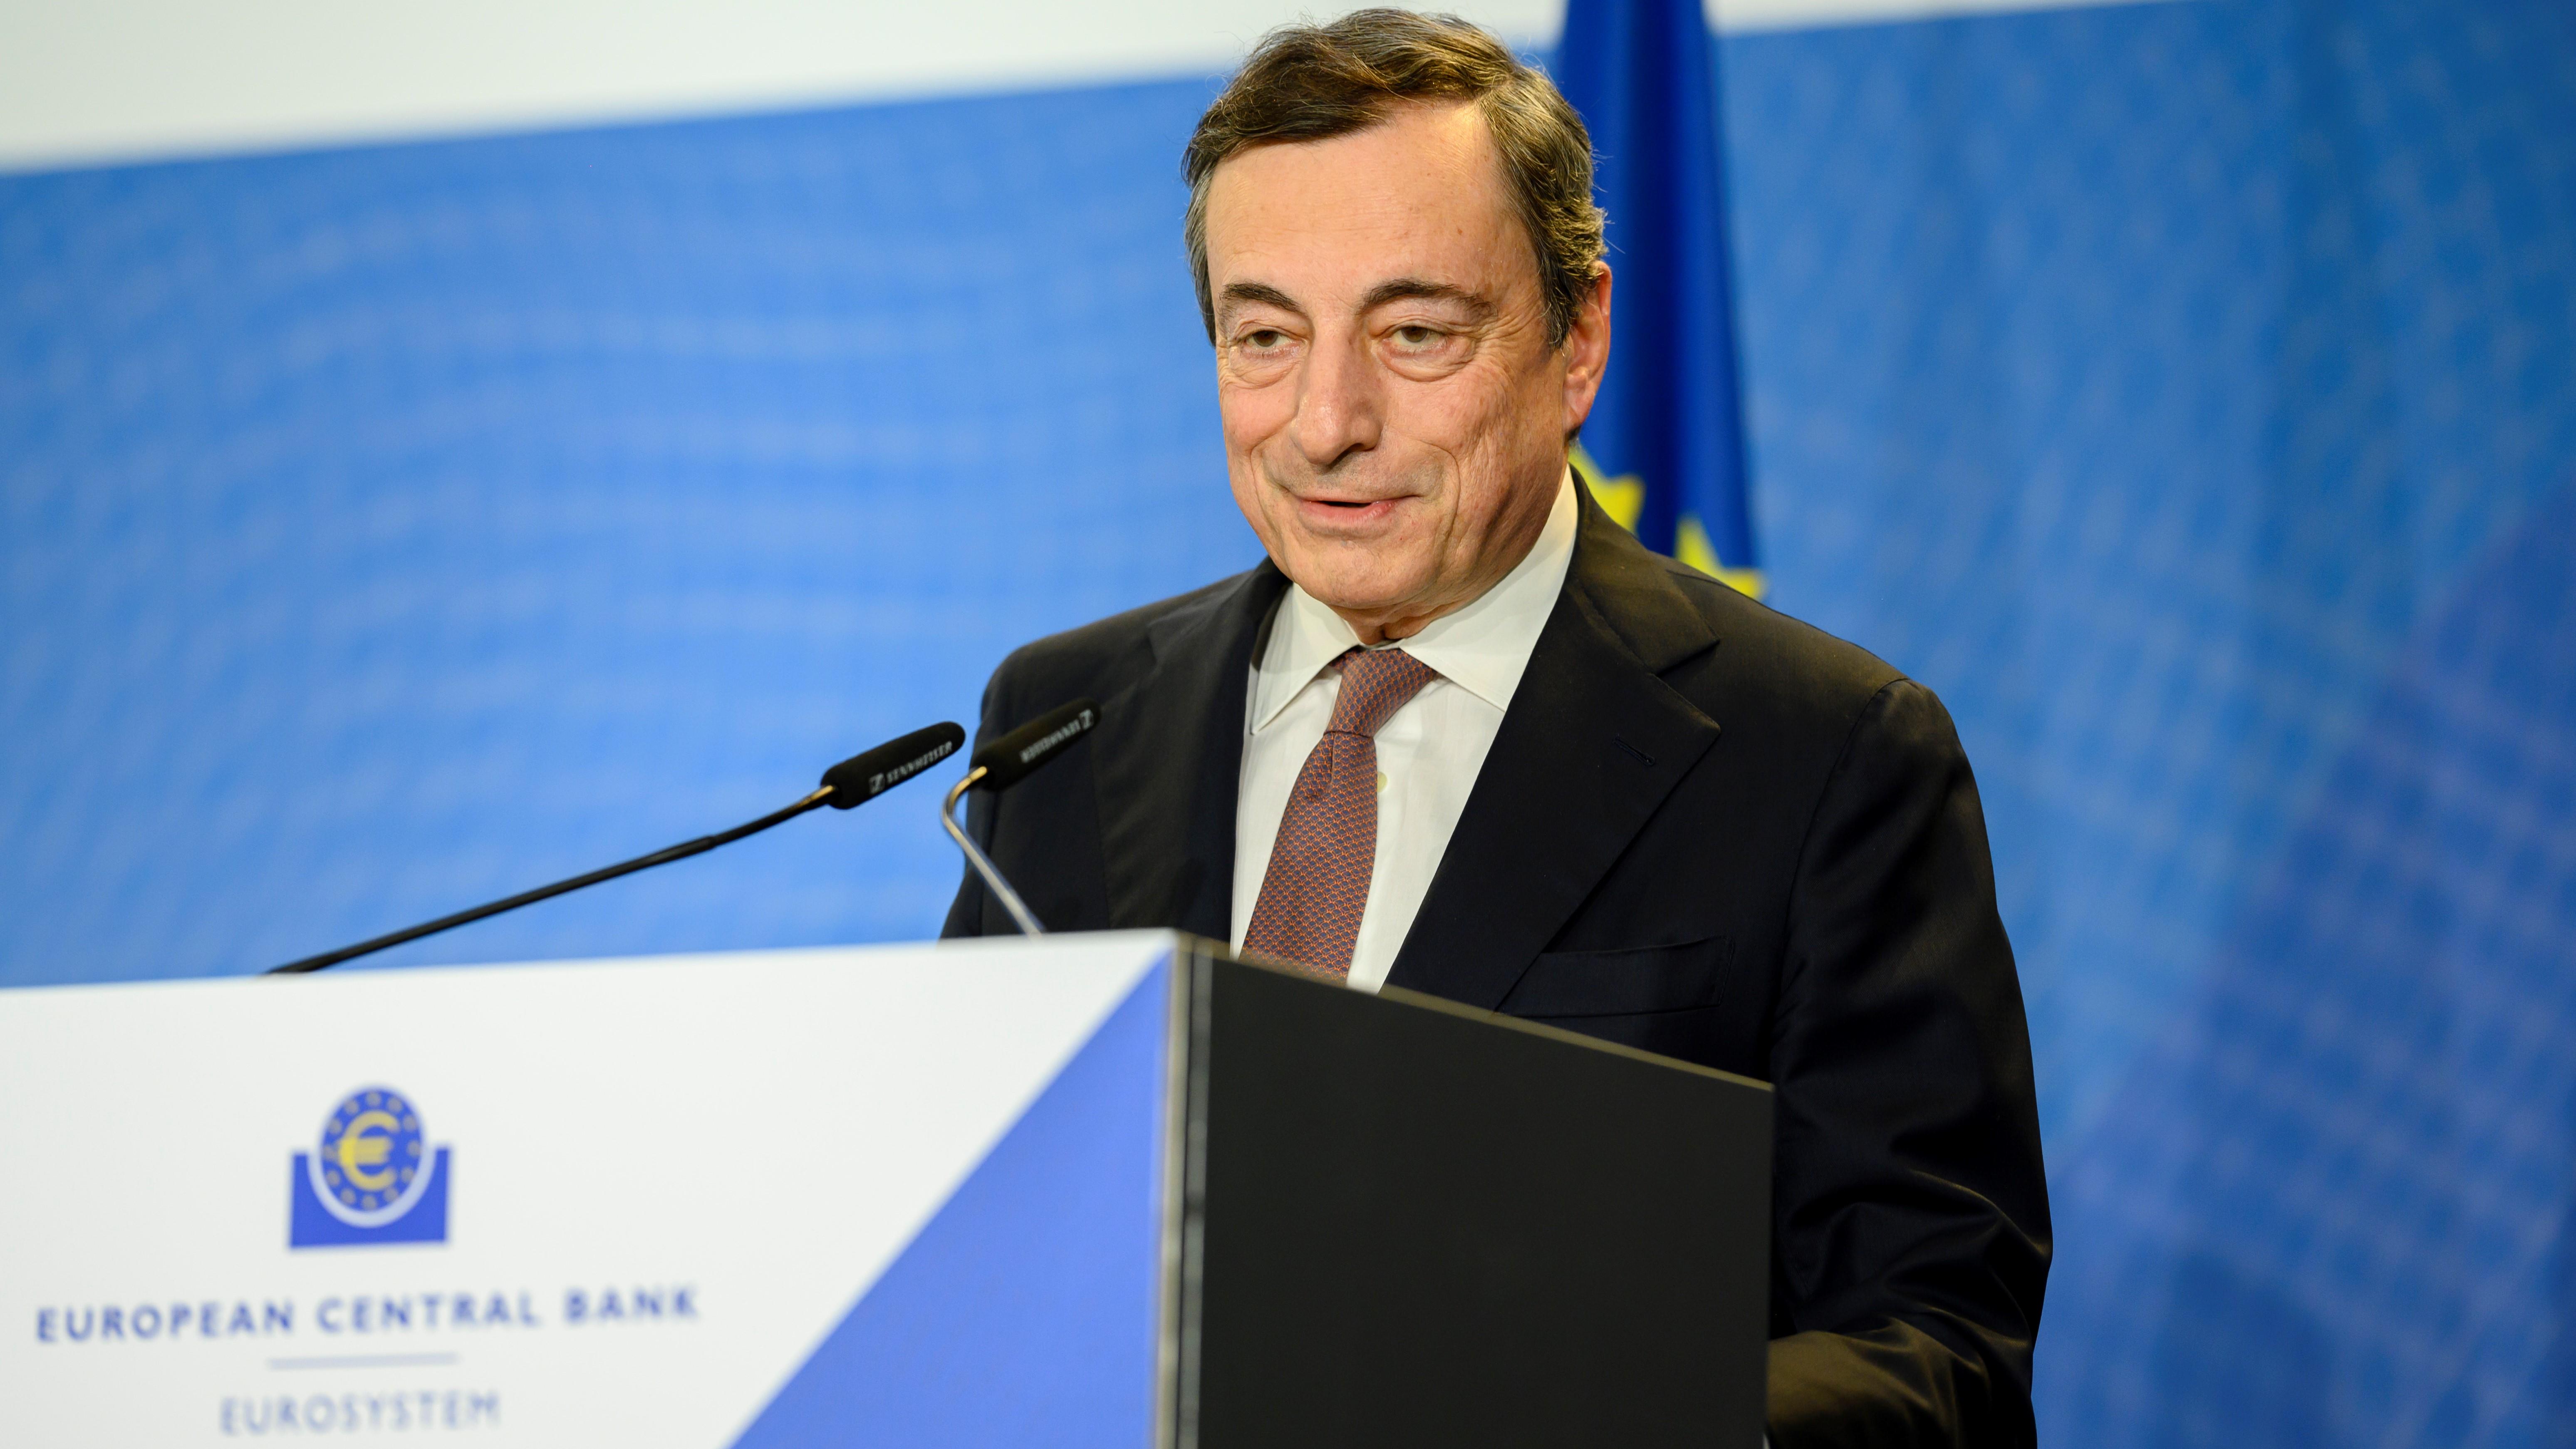 Gert Sørensen: Den tidligere ECB-direktør Mario Draghi ser ud til at være løsningen på Italiens politiske krise